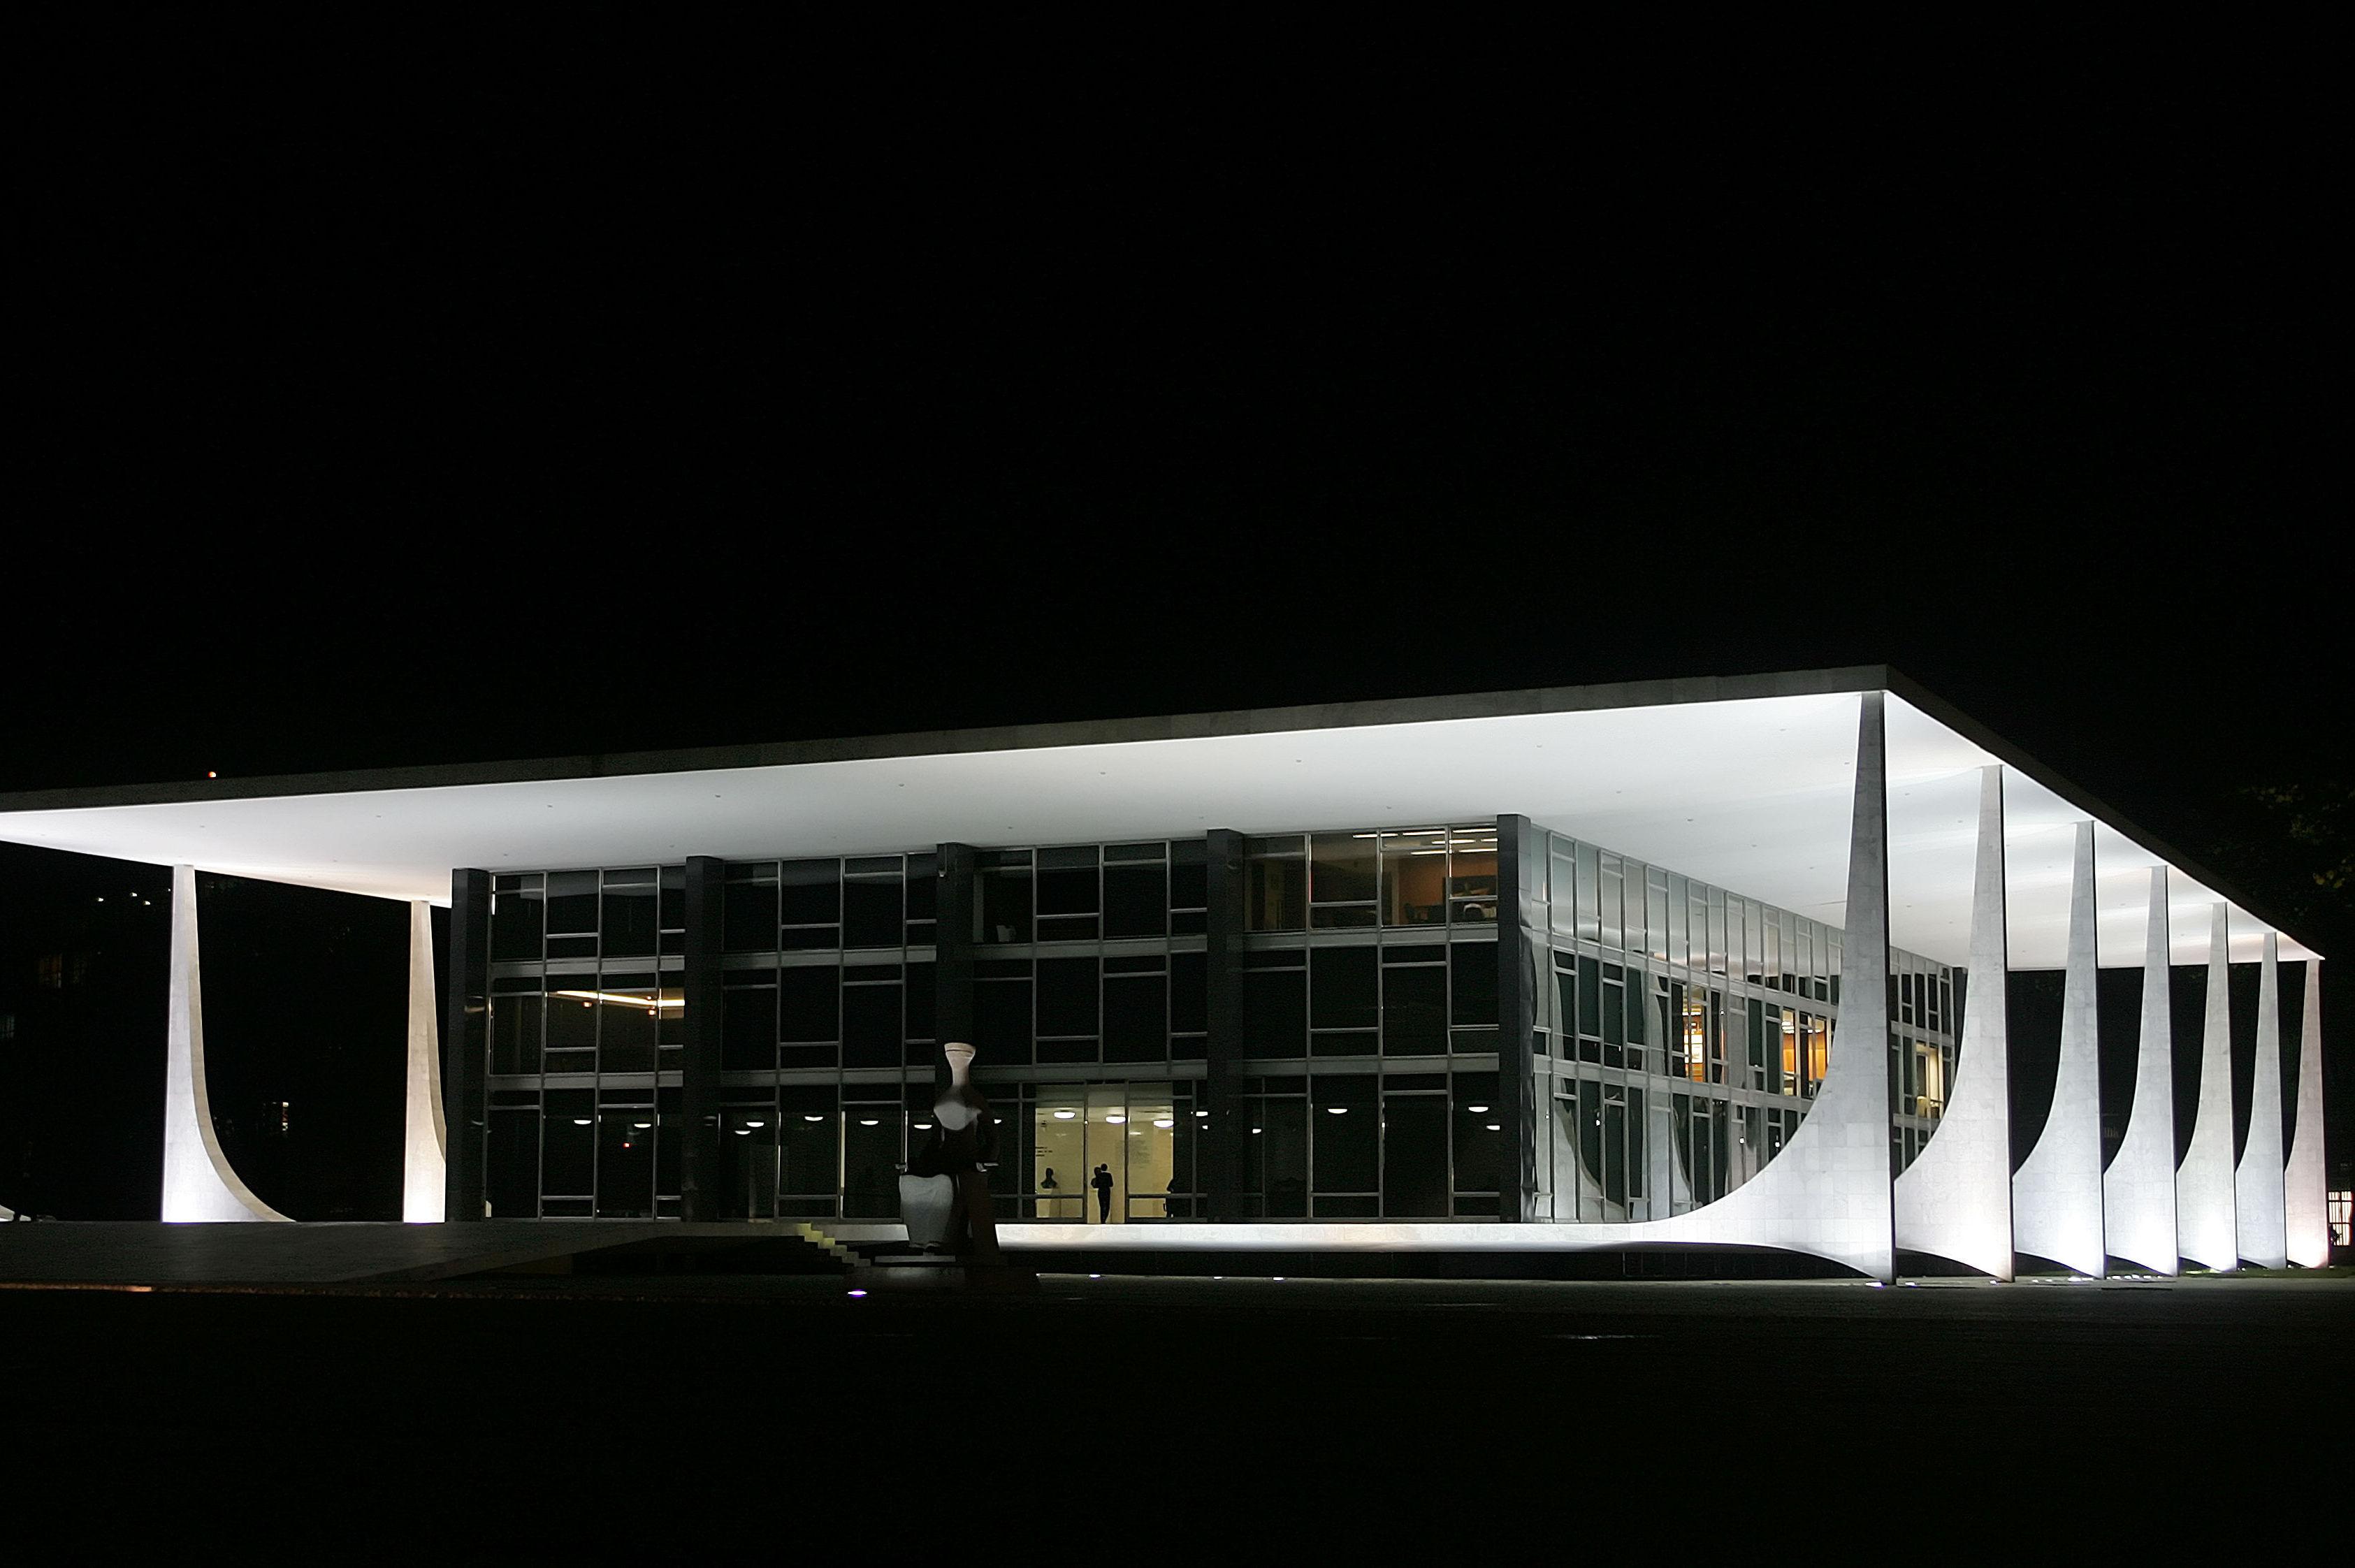 The Federal Supreme Court in Brasilia.